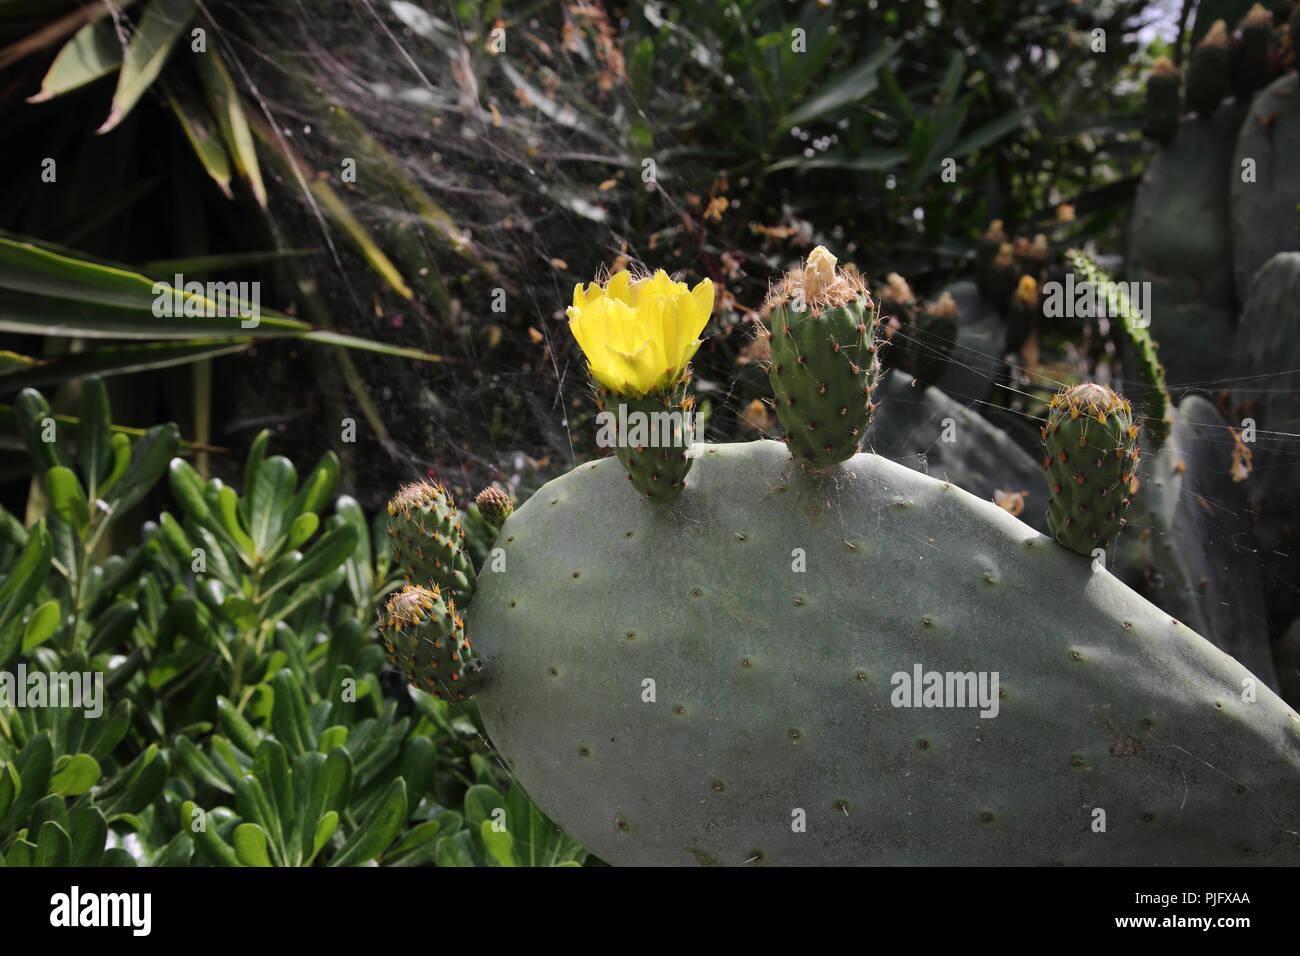 Vouliagmeni ATTIKA Griechenland Nahaufnahme einer Blüte indischen Bild Kaktus (Opuntia Ficus-Indica) Stockbild